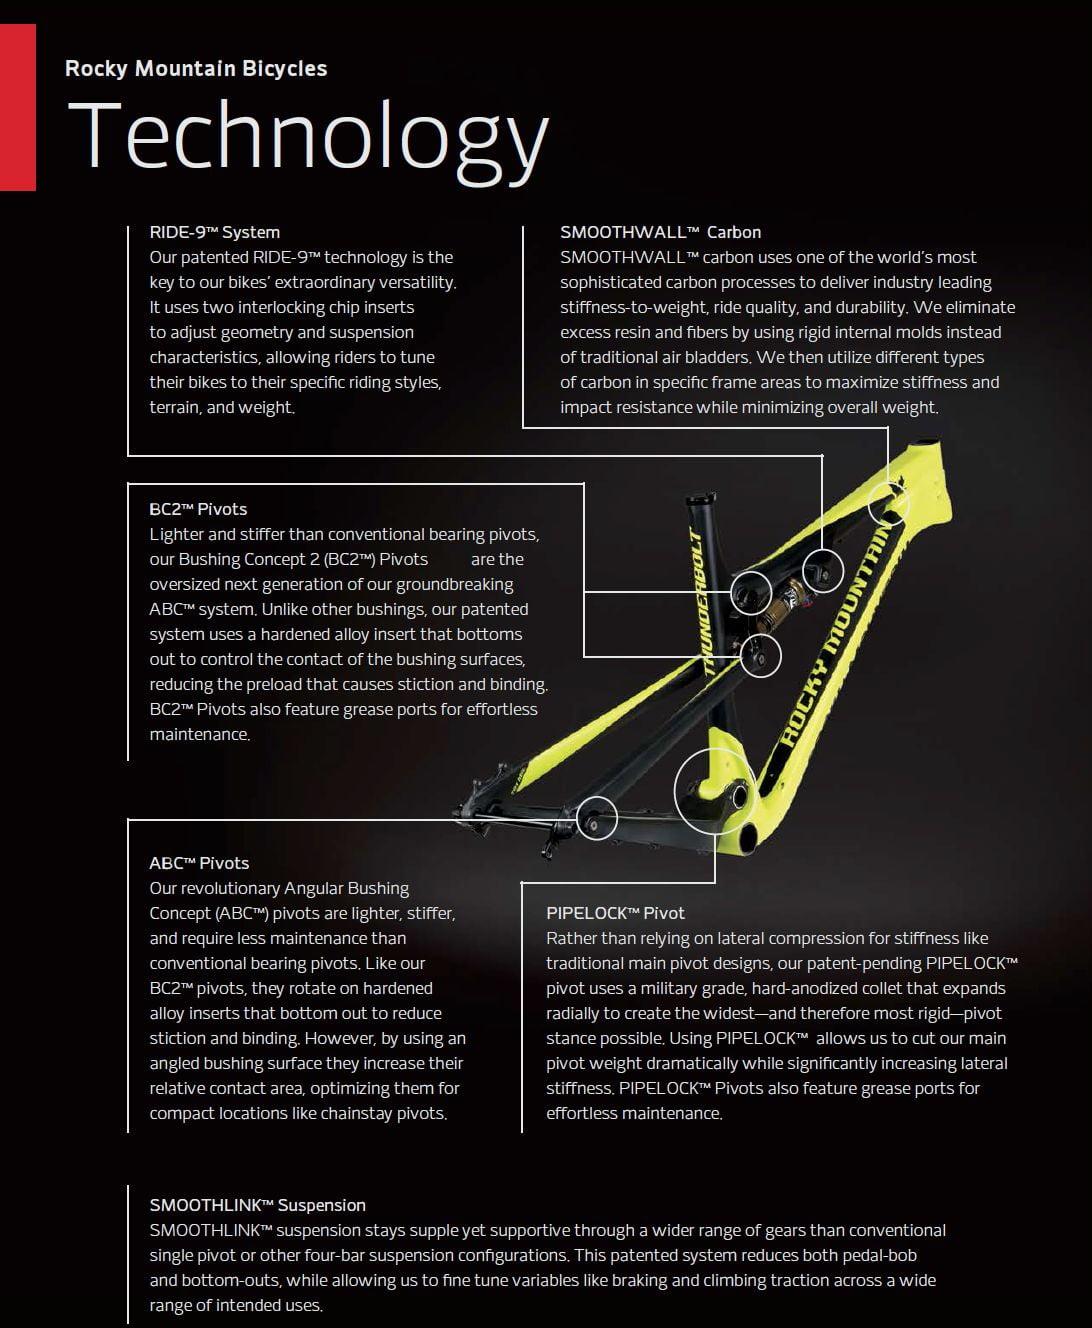 tecnologie-thunderbolt